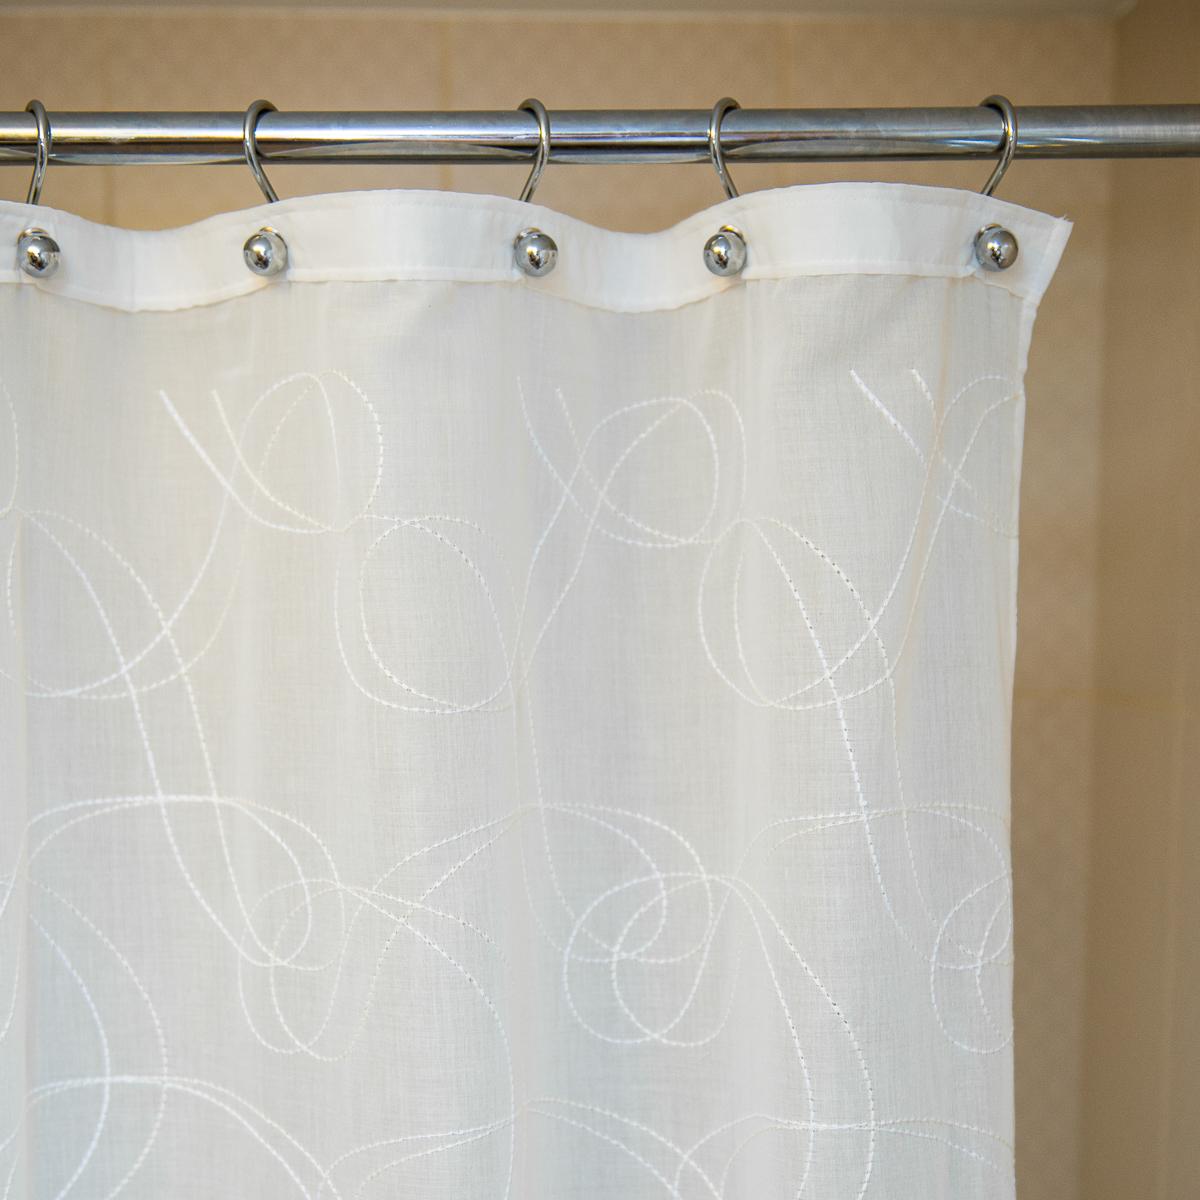 Шторки Элитная шторка для ванной Embroidery 1805 C. Natural от Arti-Deco elitnaya-shtorka-dlya-vannoy-embroidery-1805-c-natural-ot-arti-deco-ispaniya.jpg